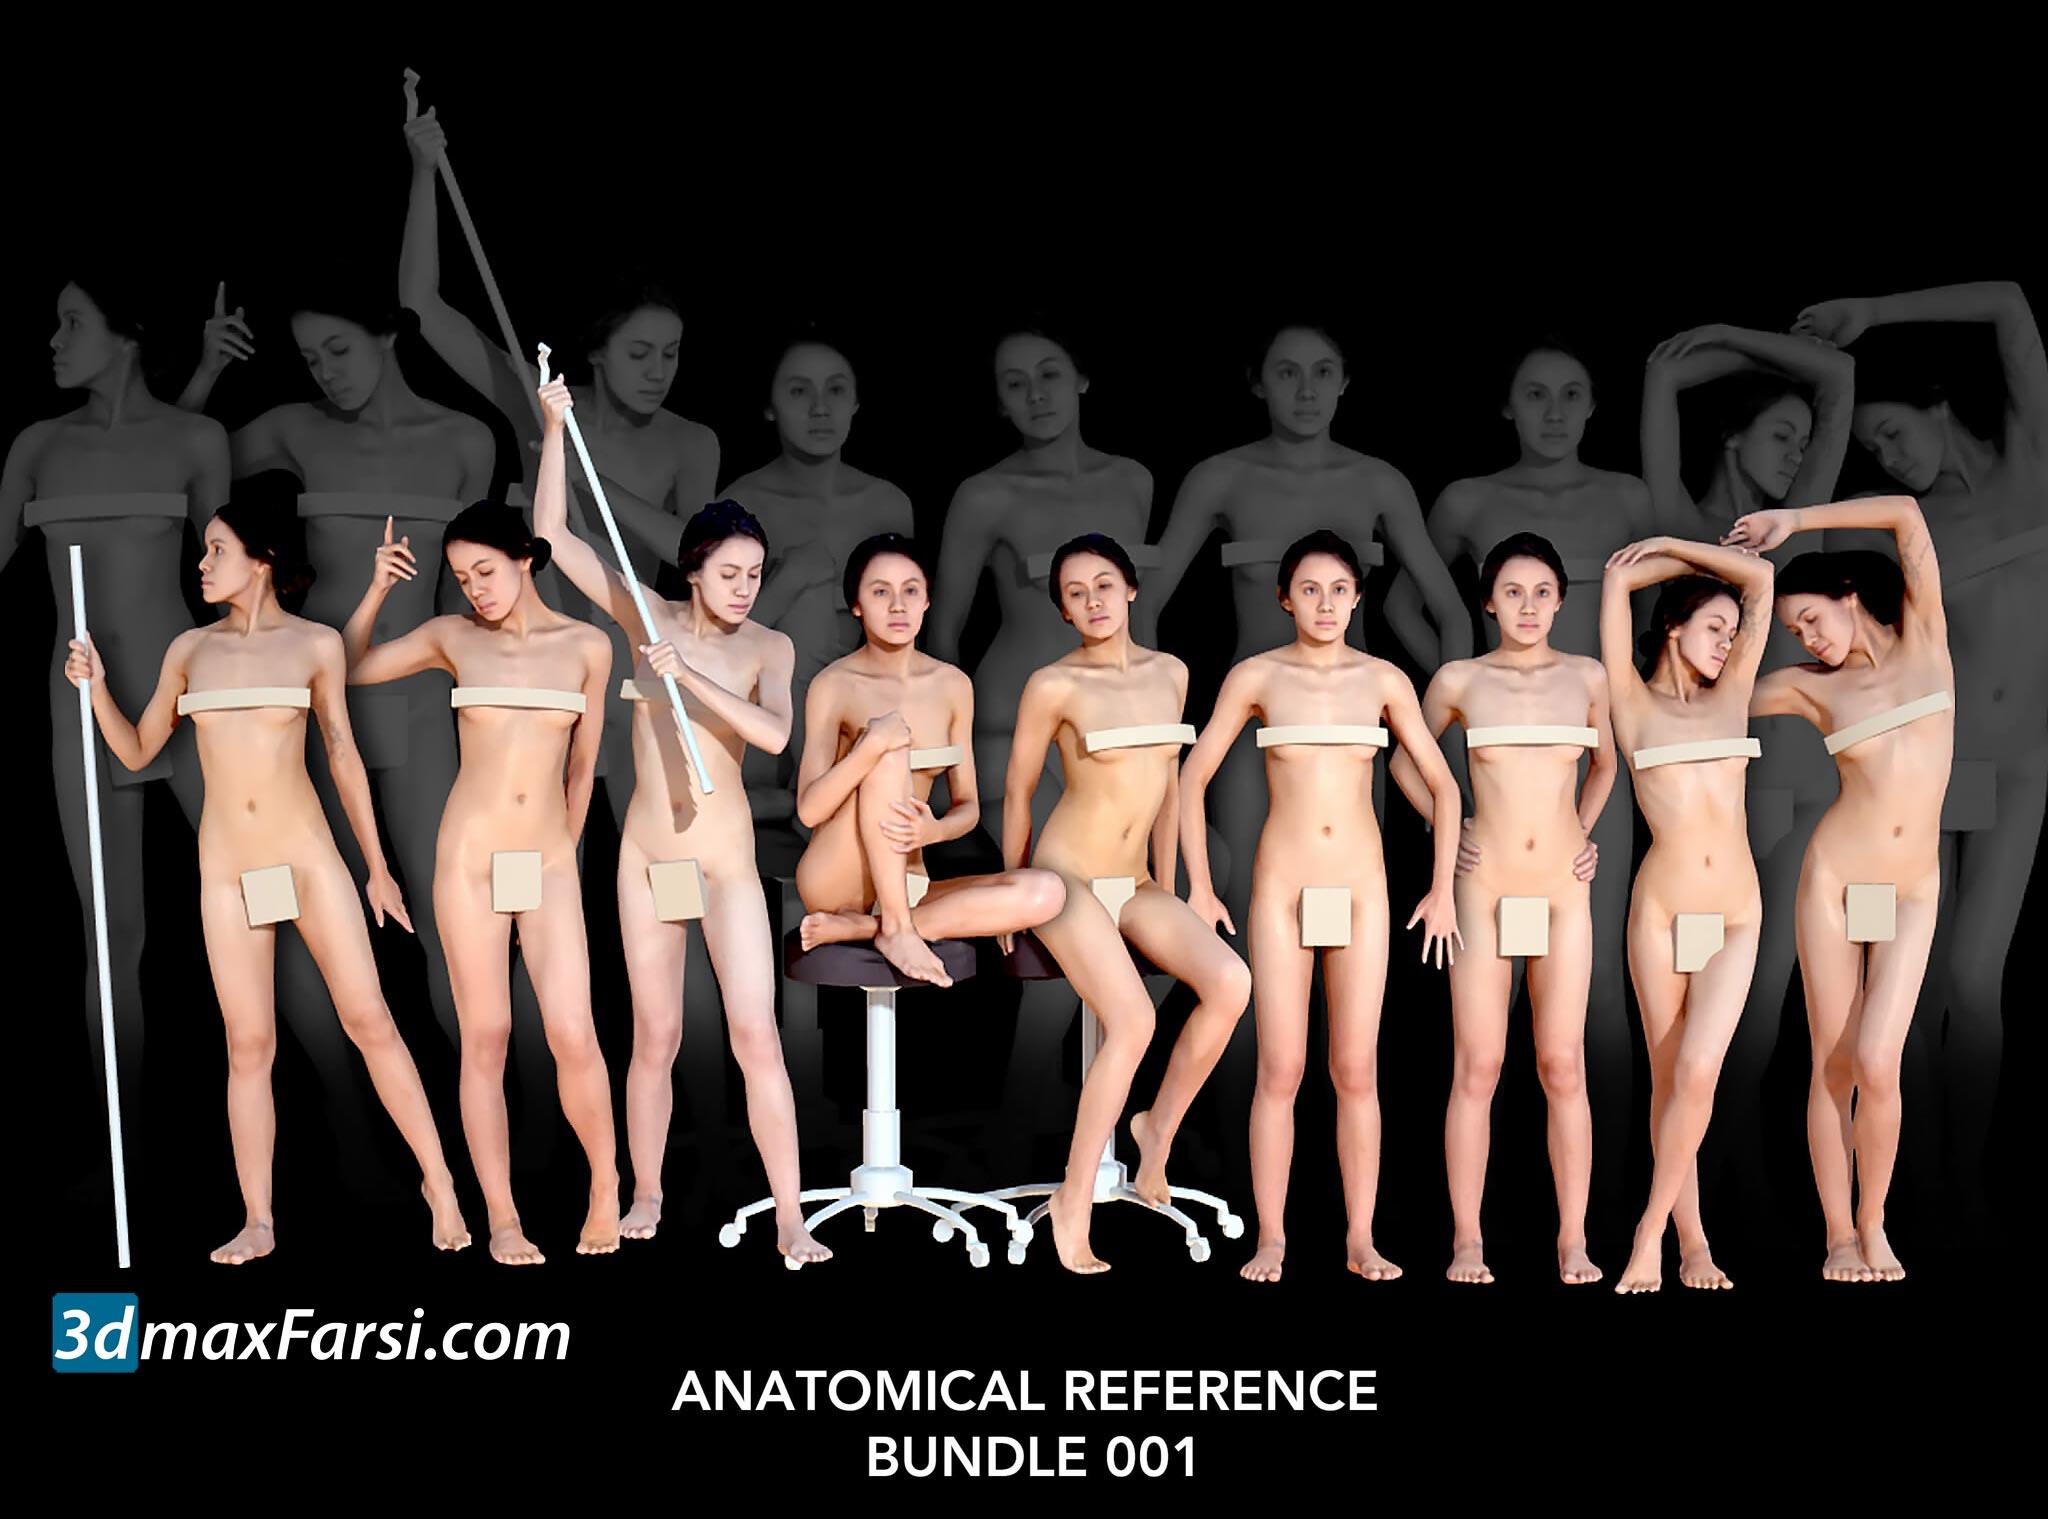 Anatomical Reference Bundle 001 People Scan free download